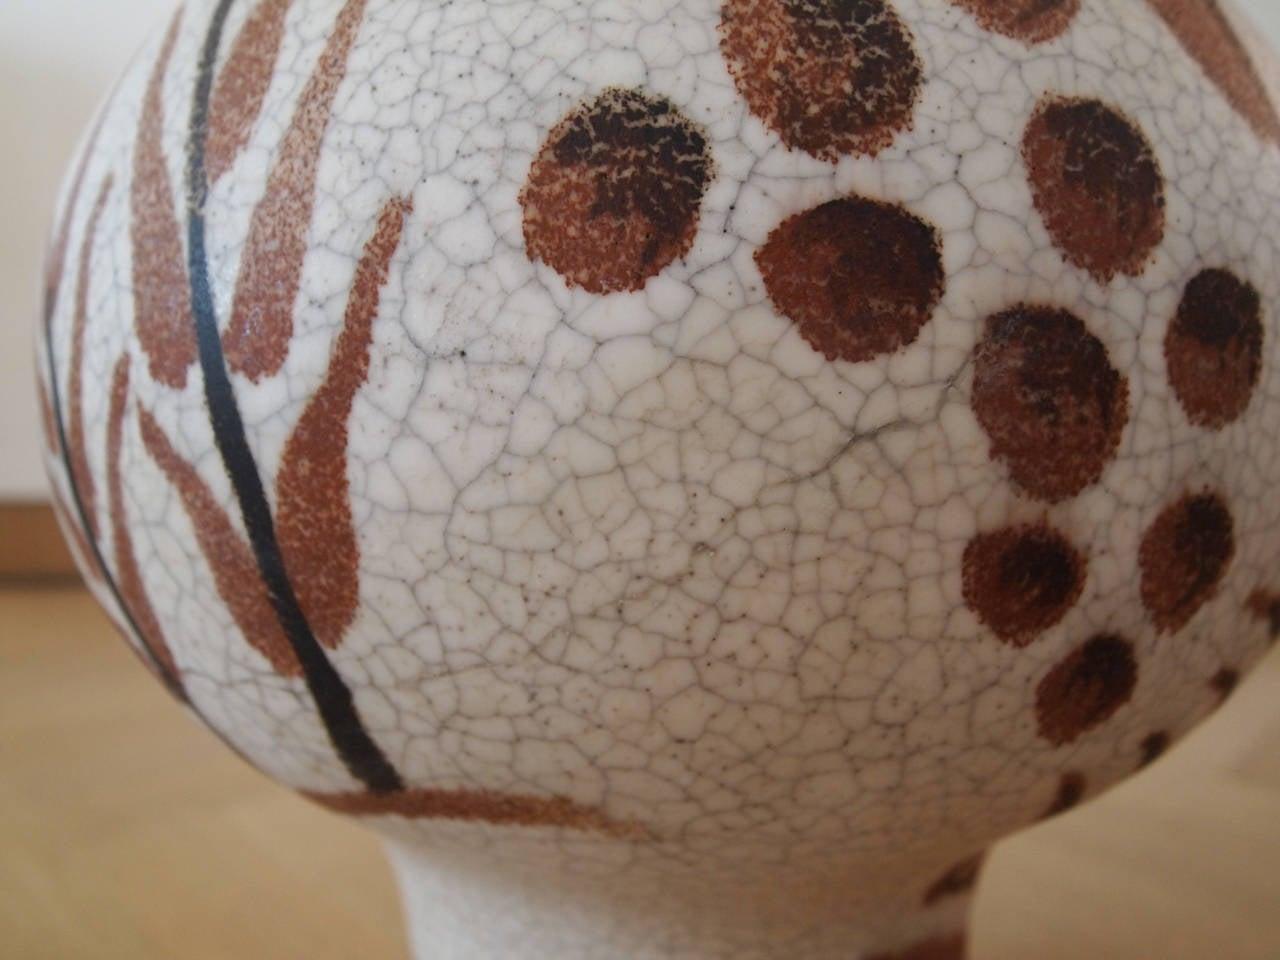 Vase by Primavera 5